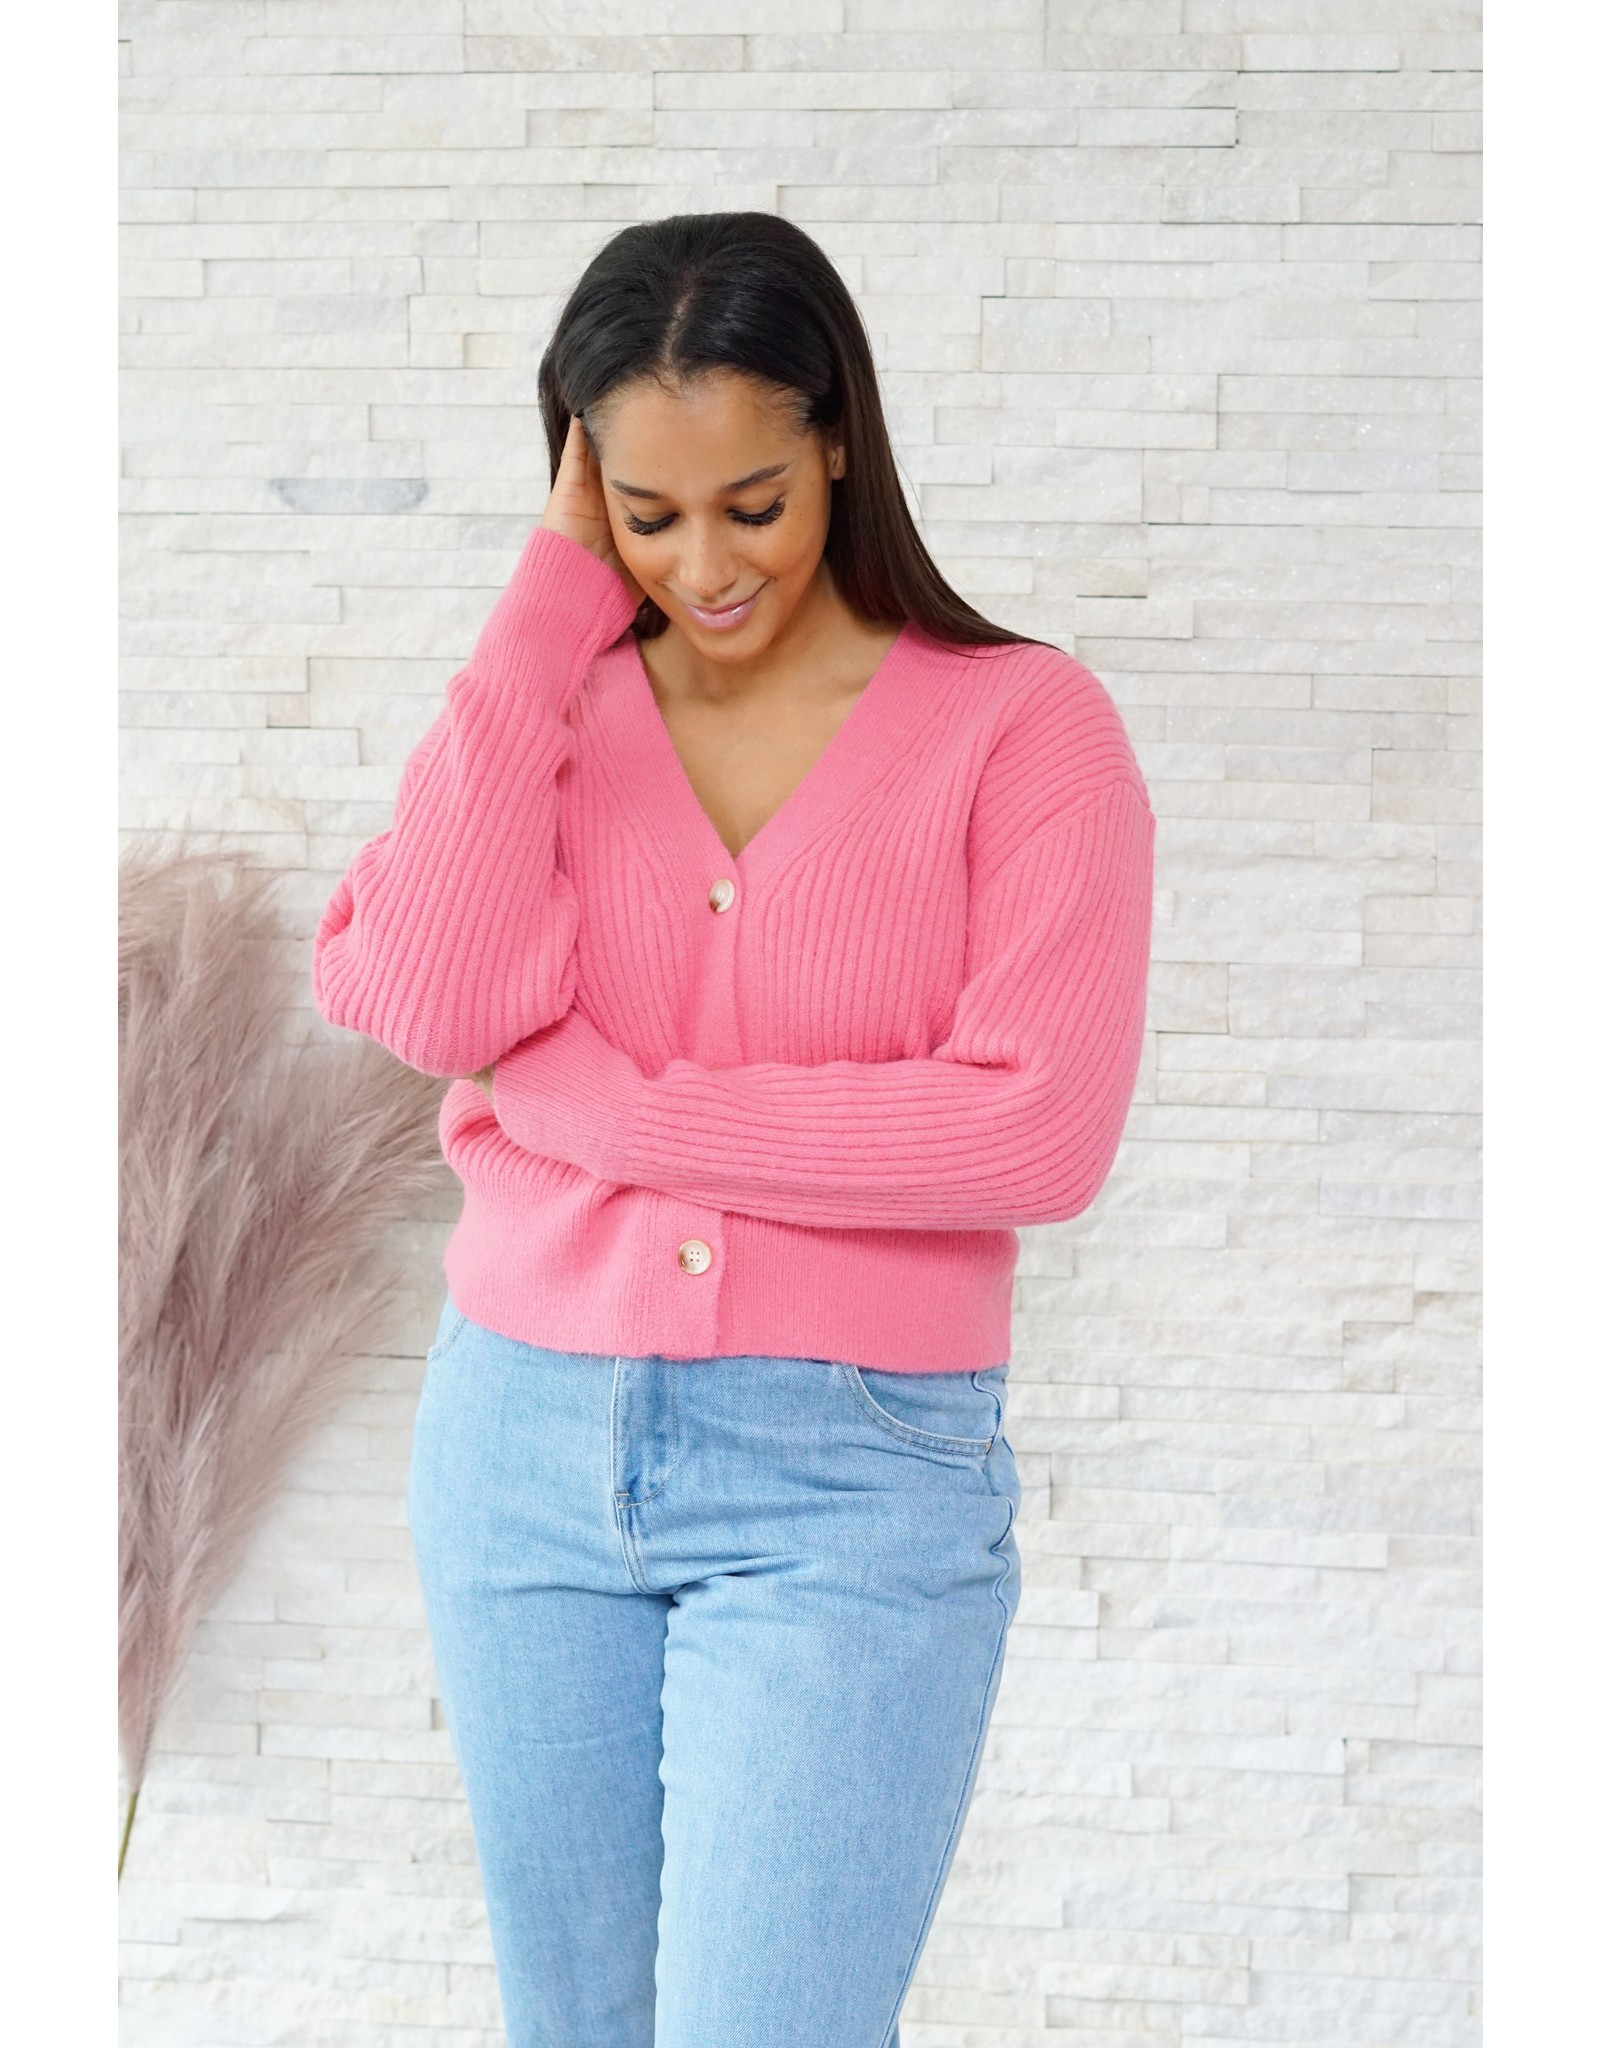 Cute cardigan  pink